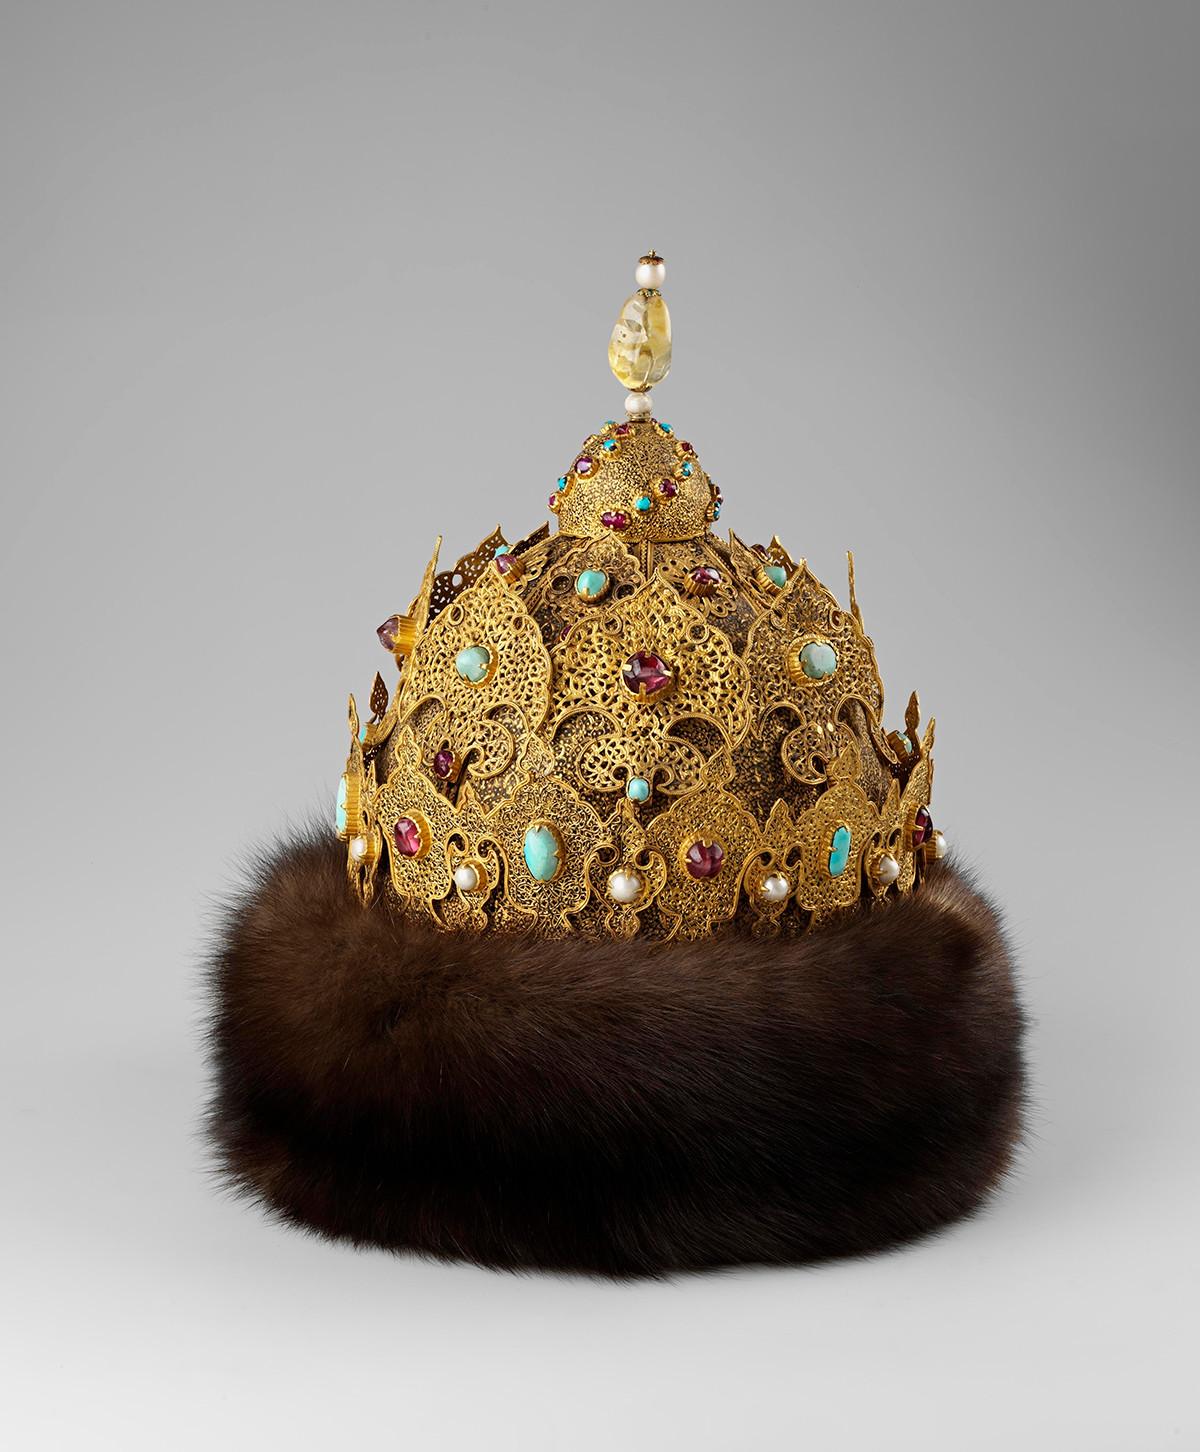 Bonnet de Kazan, 1553-1558. Appartenait au tsar Ivan le Terrible